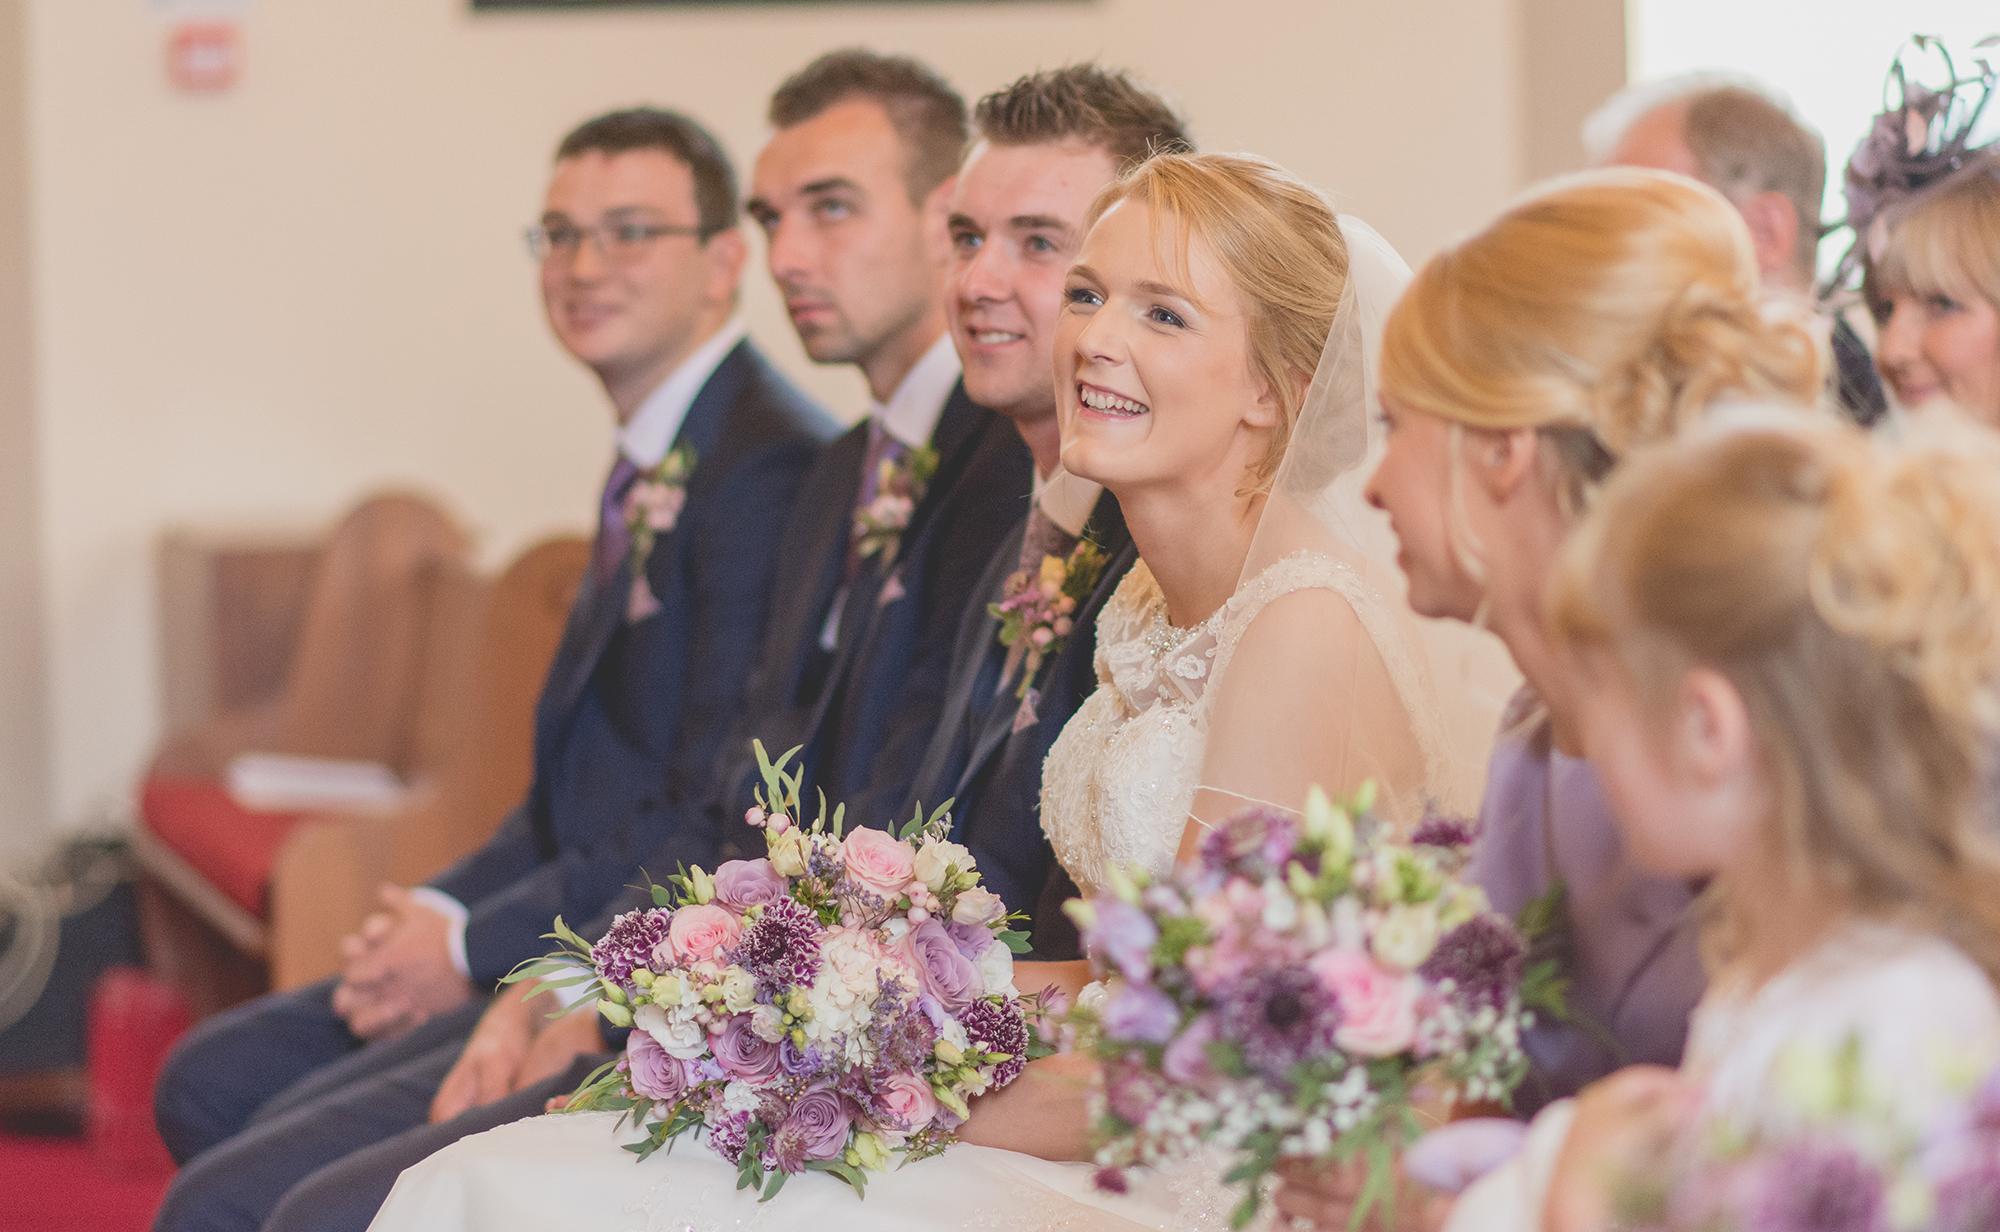 ballygally wedding photography tc photography larne belfast lisburn 21